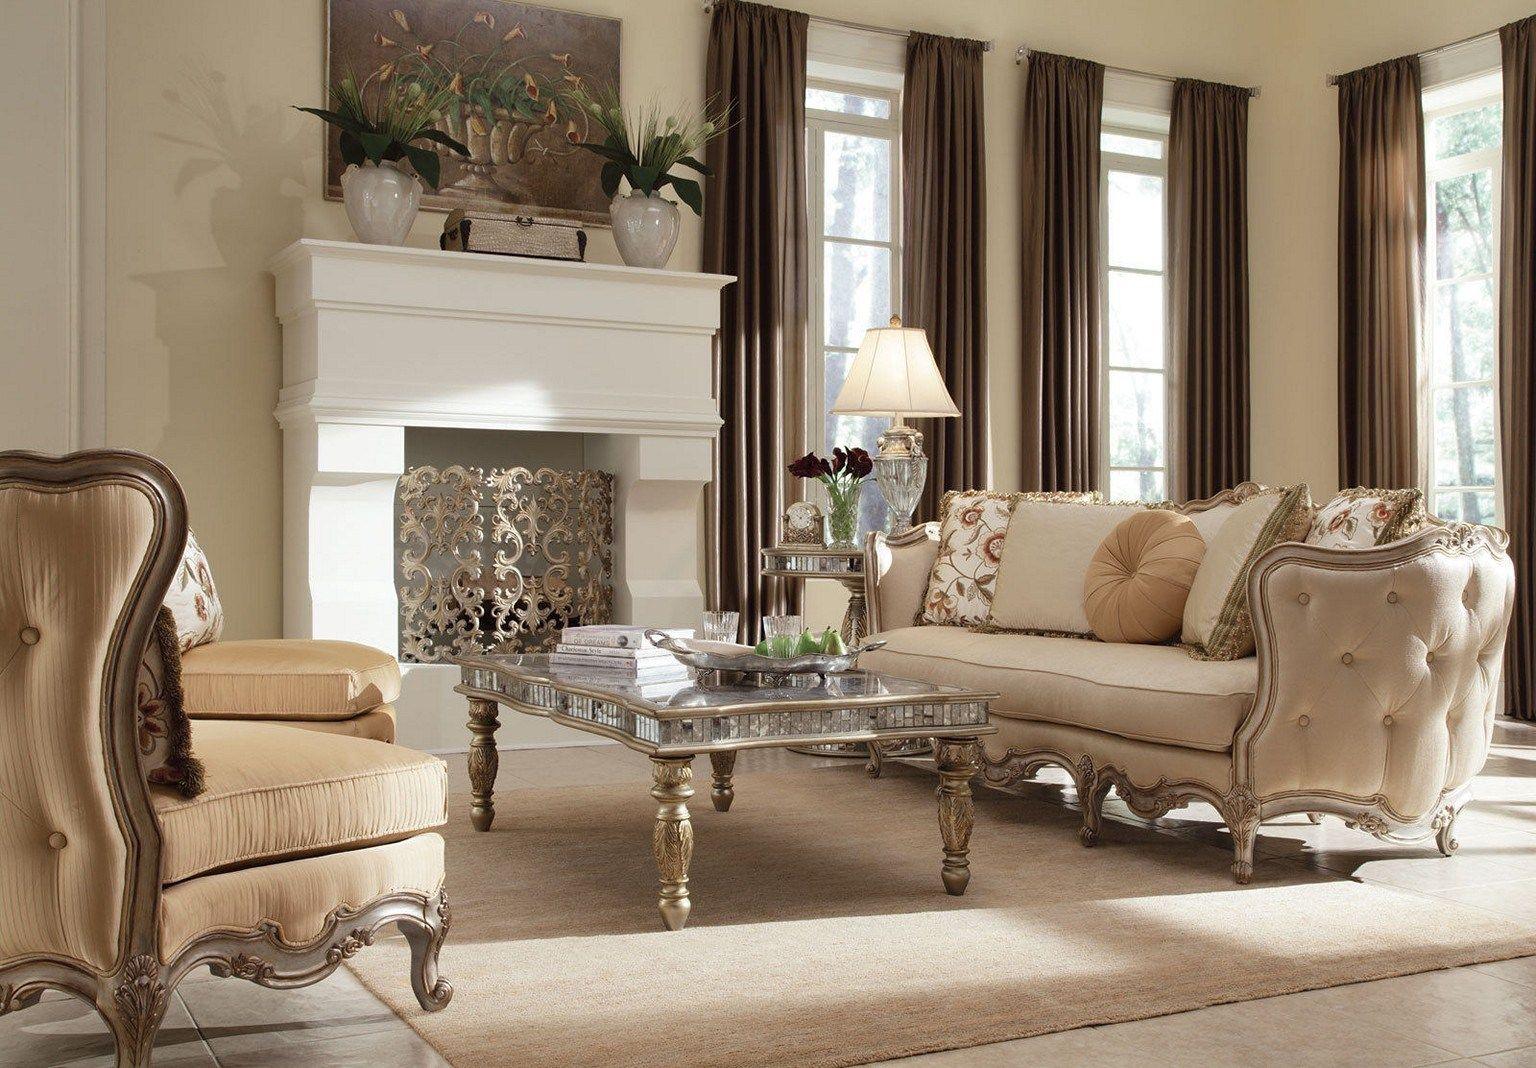 11 Smart Designs Of How To Make 3 Piece Living Room Set Cheap In 2021 Living Room Sets Elegant Living Room Furniture Luxury Furniture Elegant living room set